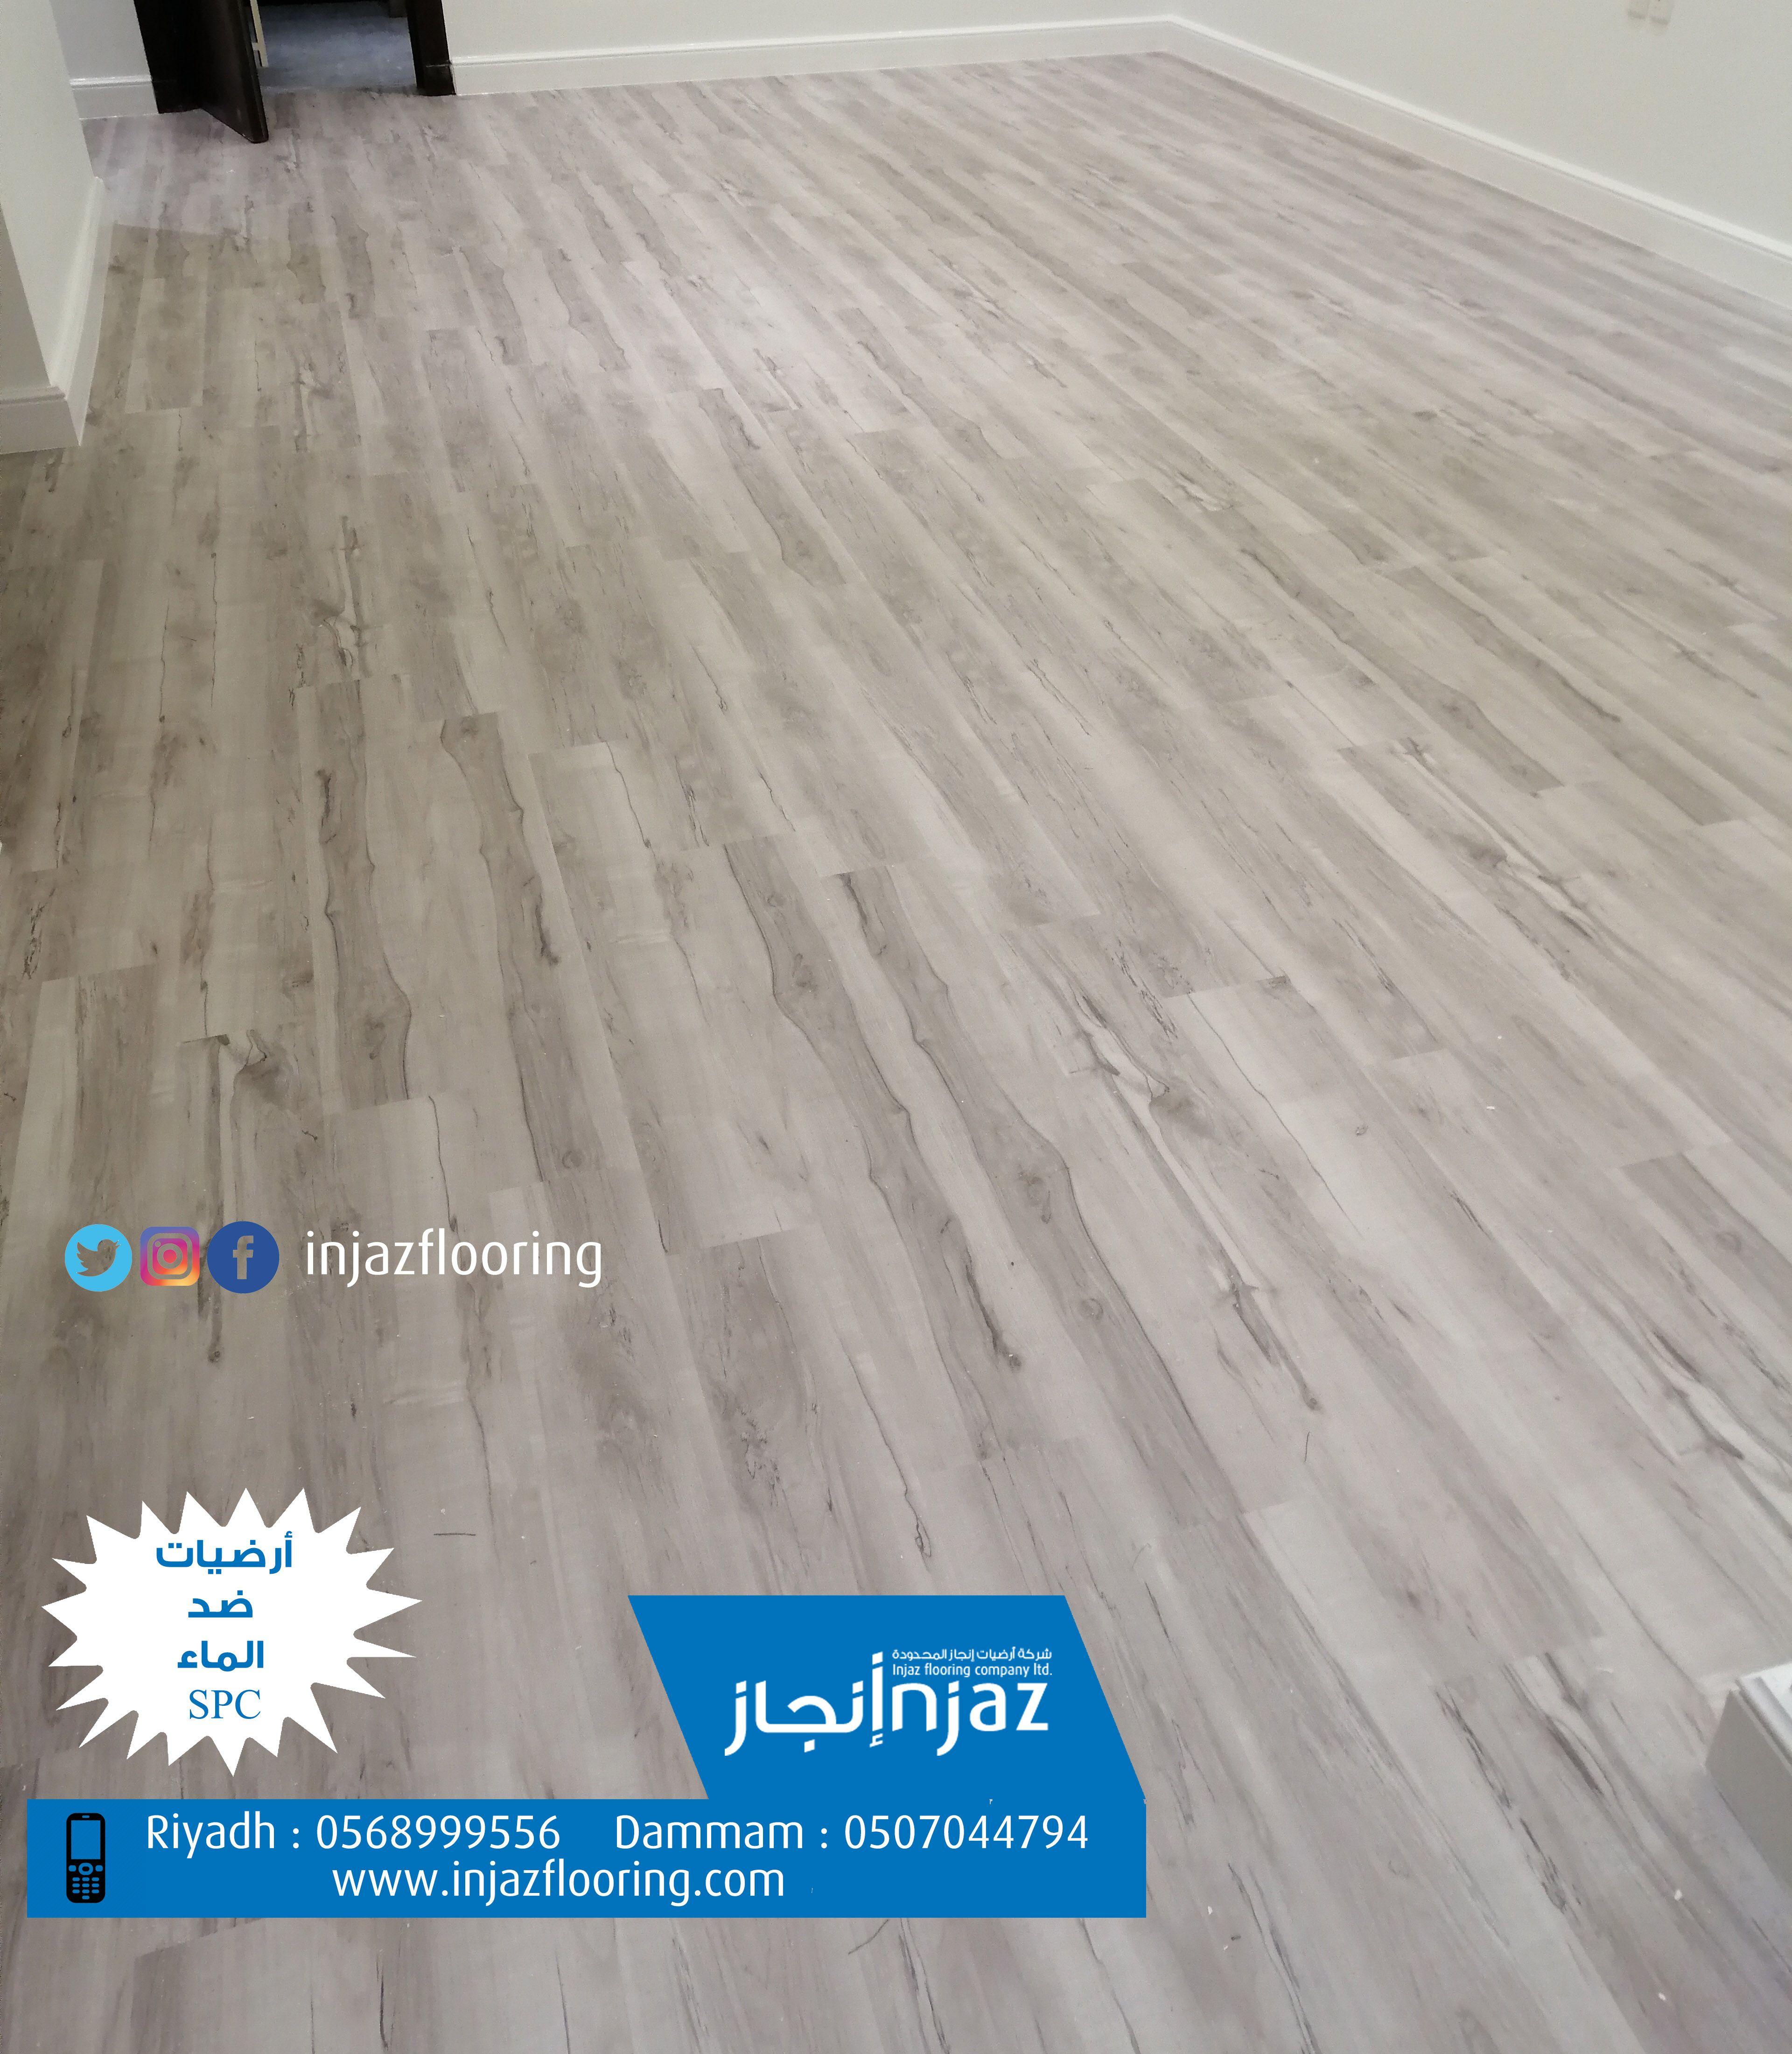 رضيات ضد الماء Spc Artificial Wood My Room High Quality Wallpapers